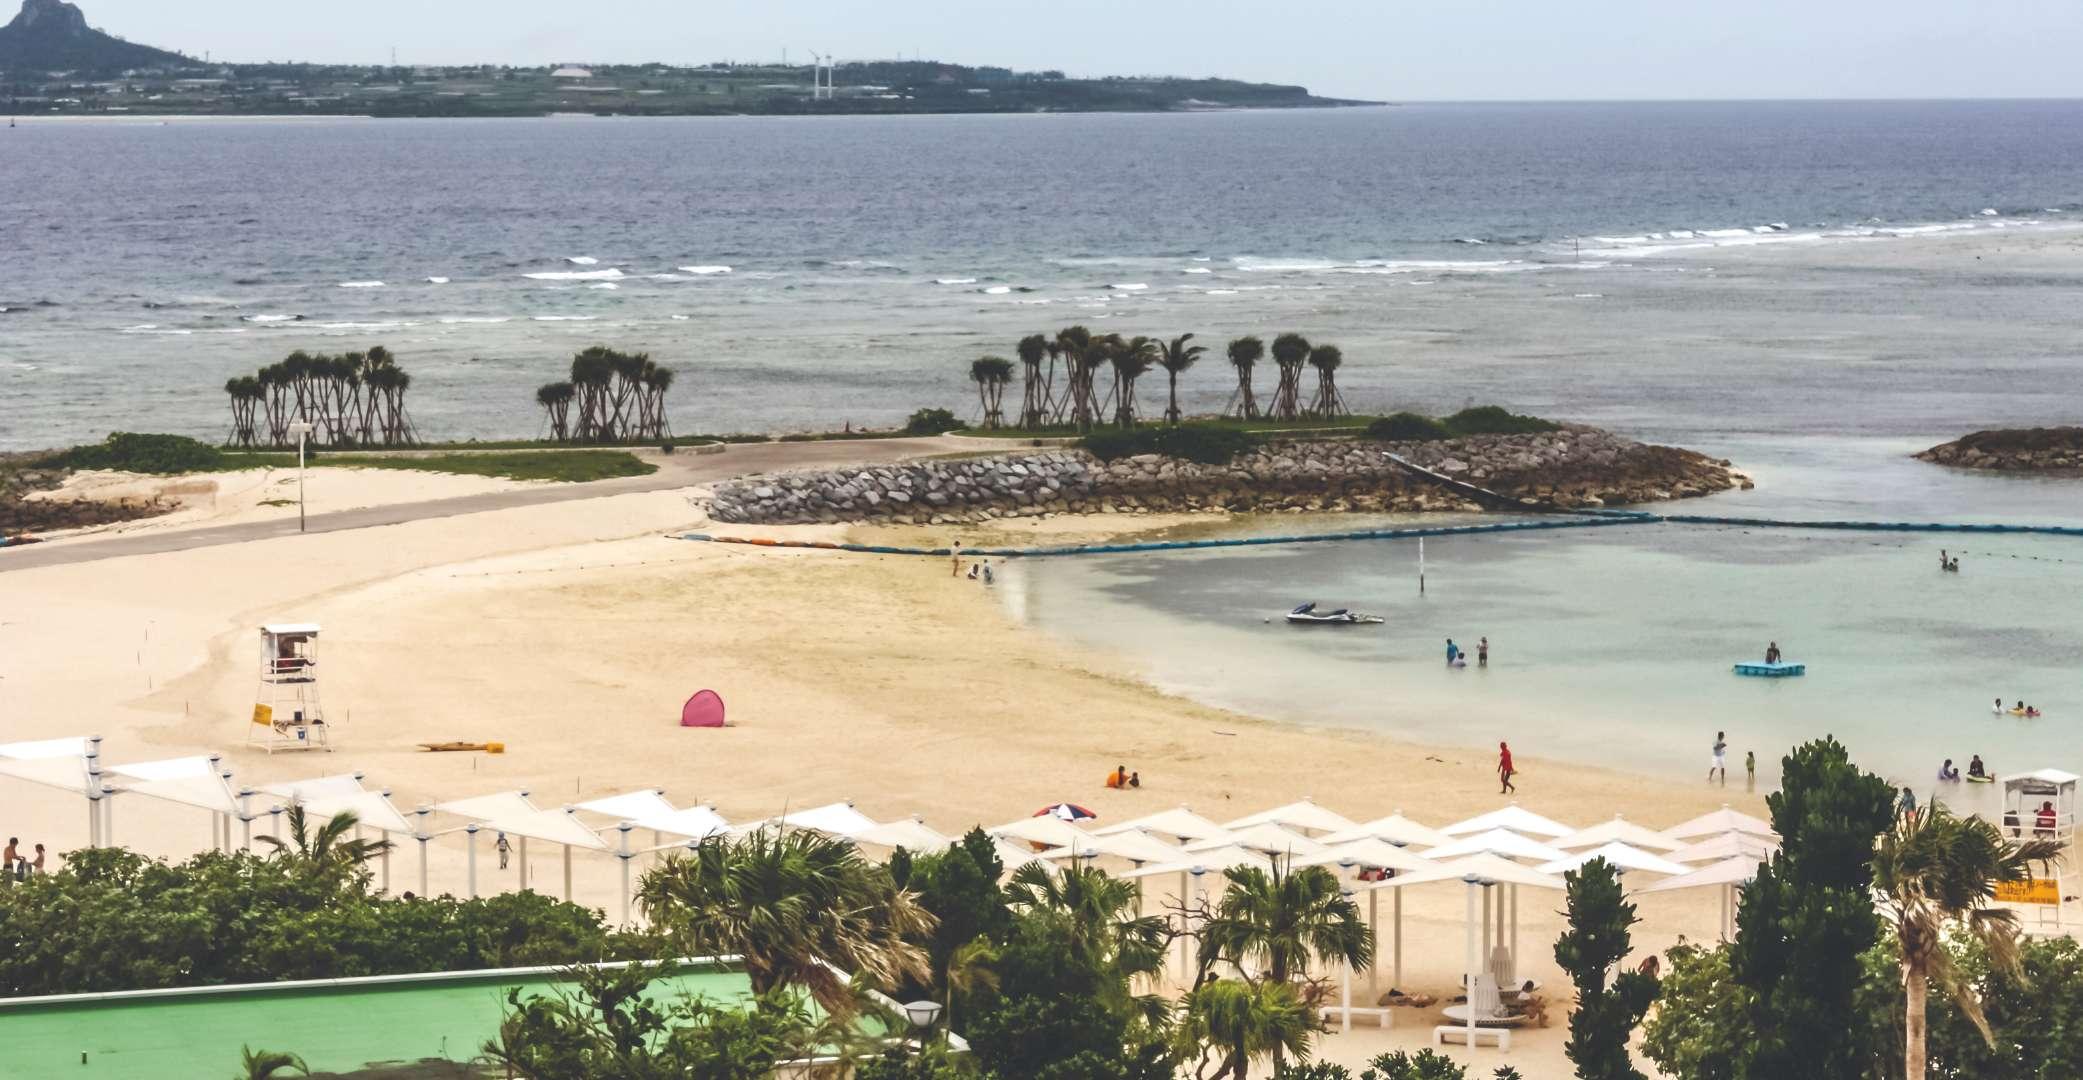 Okinawa Beach life Dave Hazzan